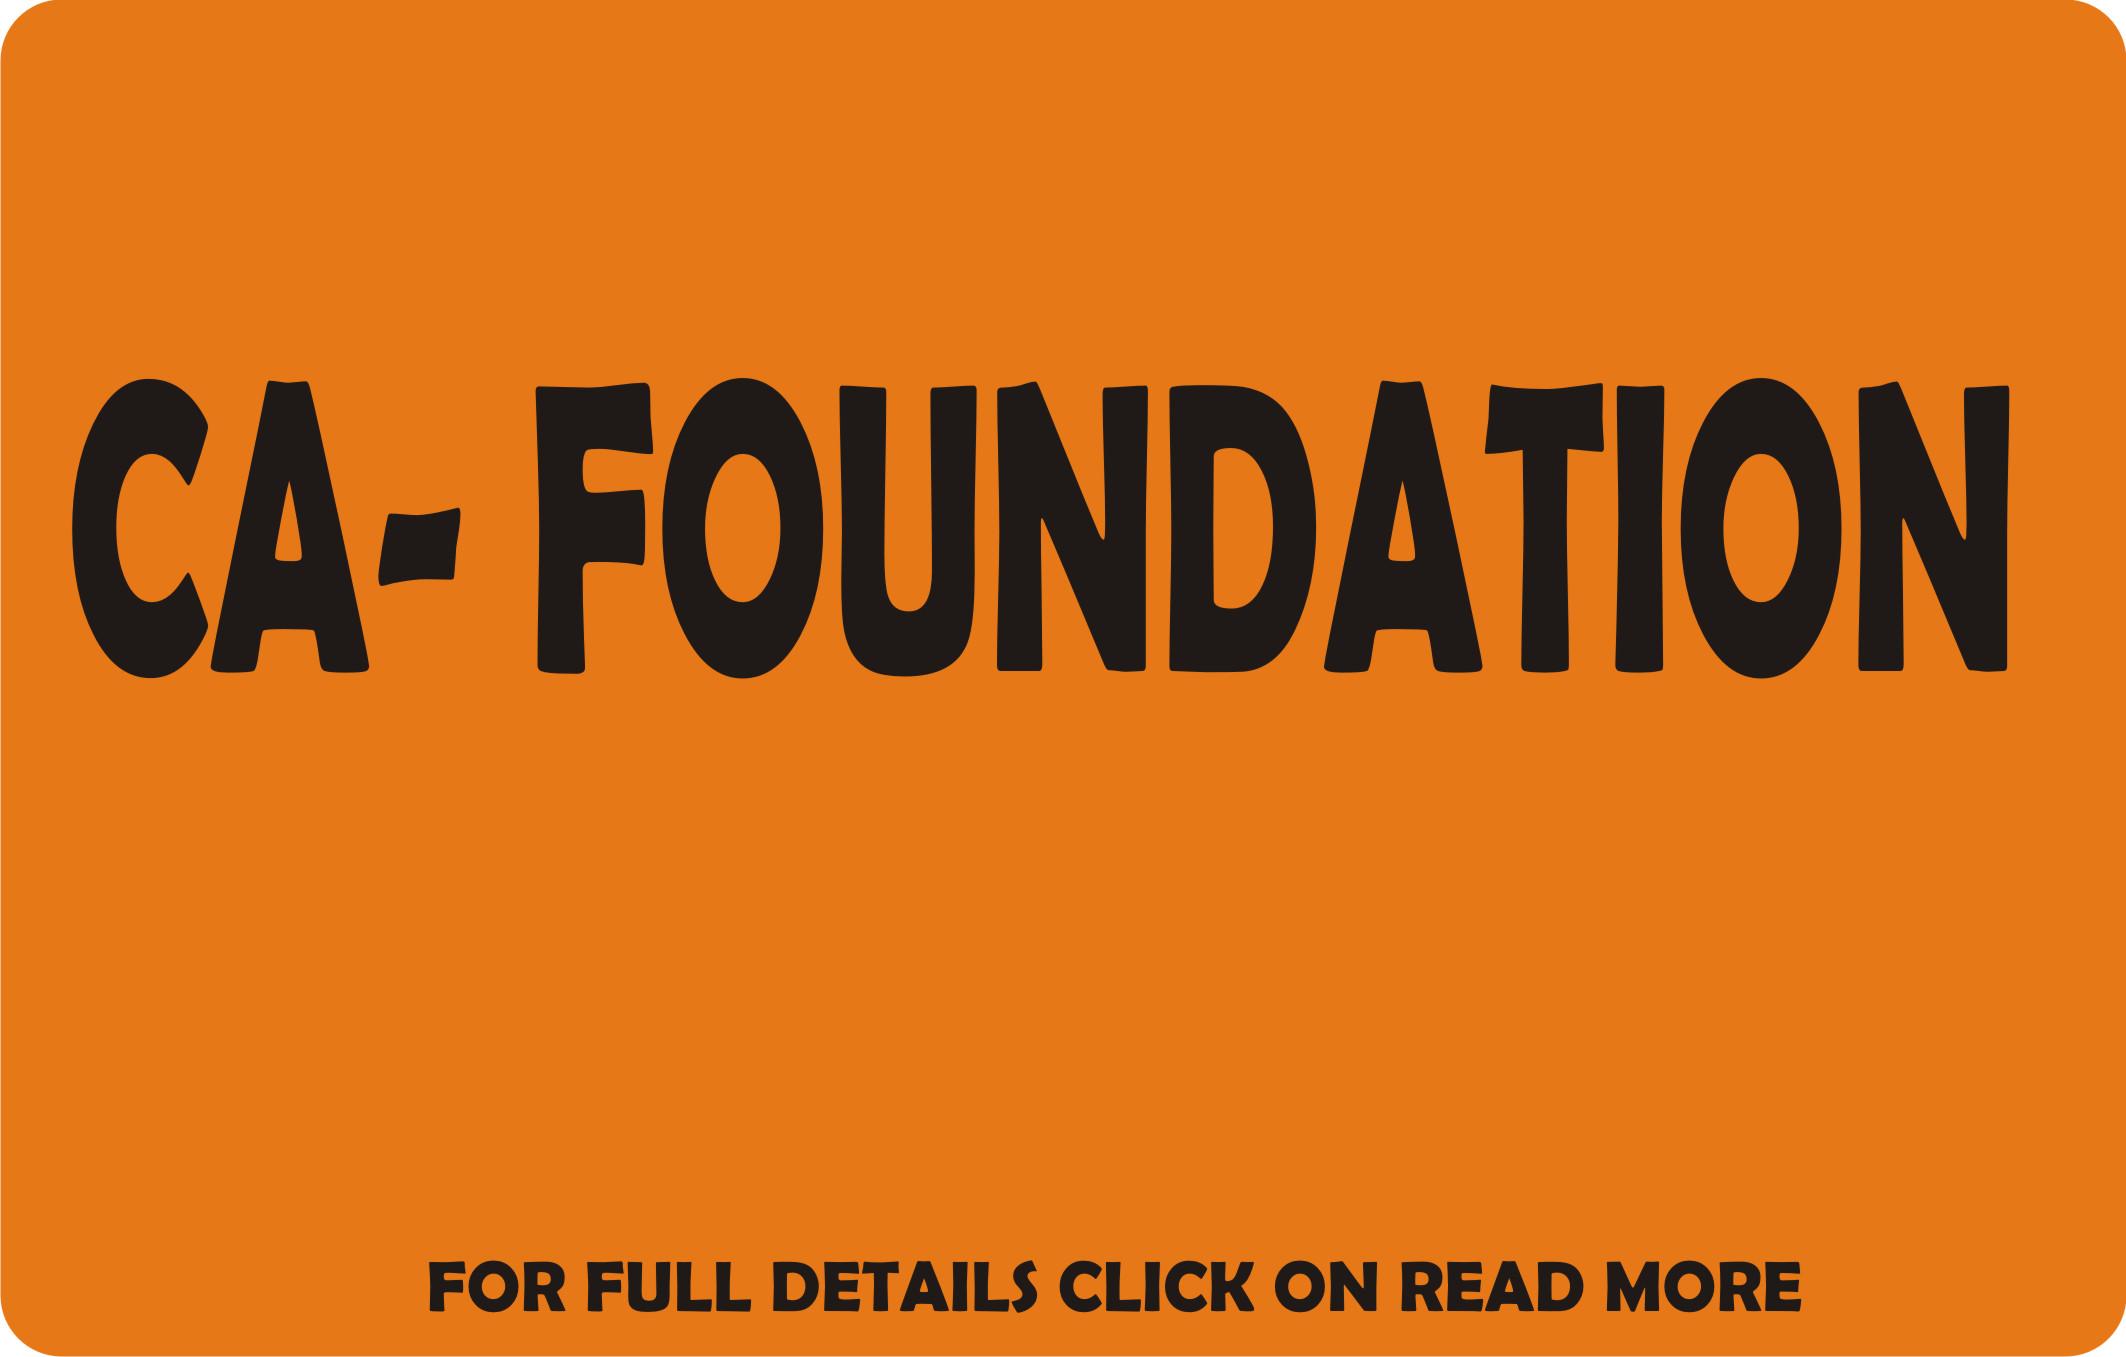 CA Foundation